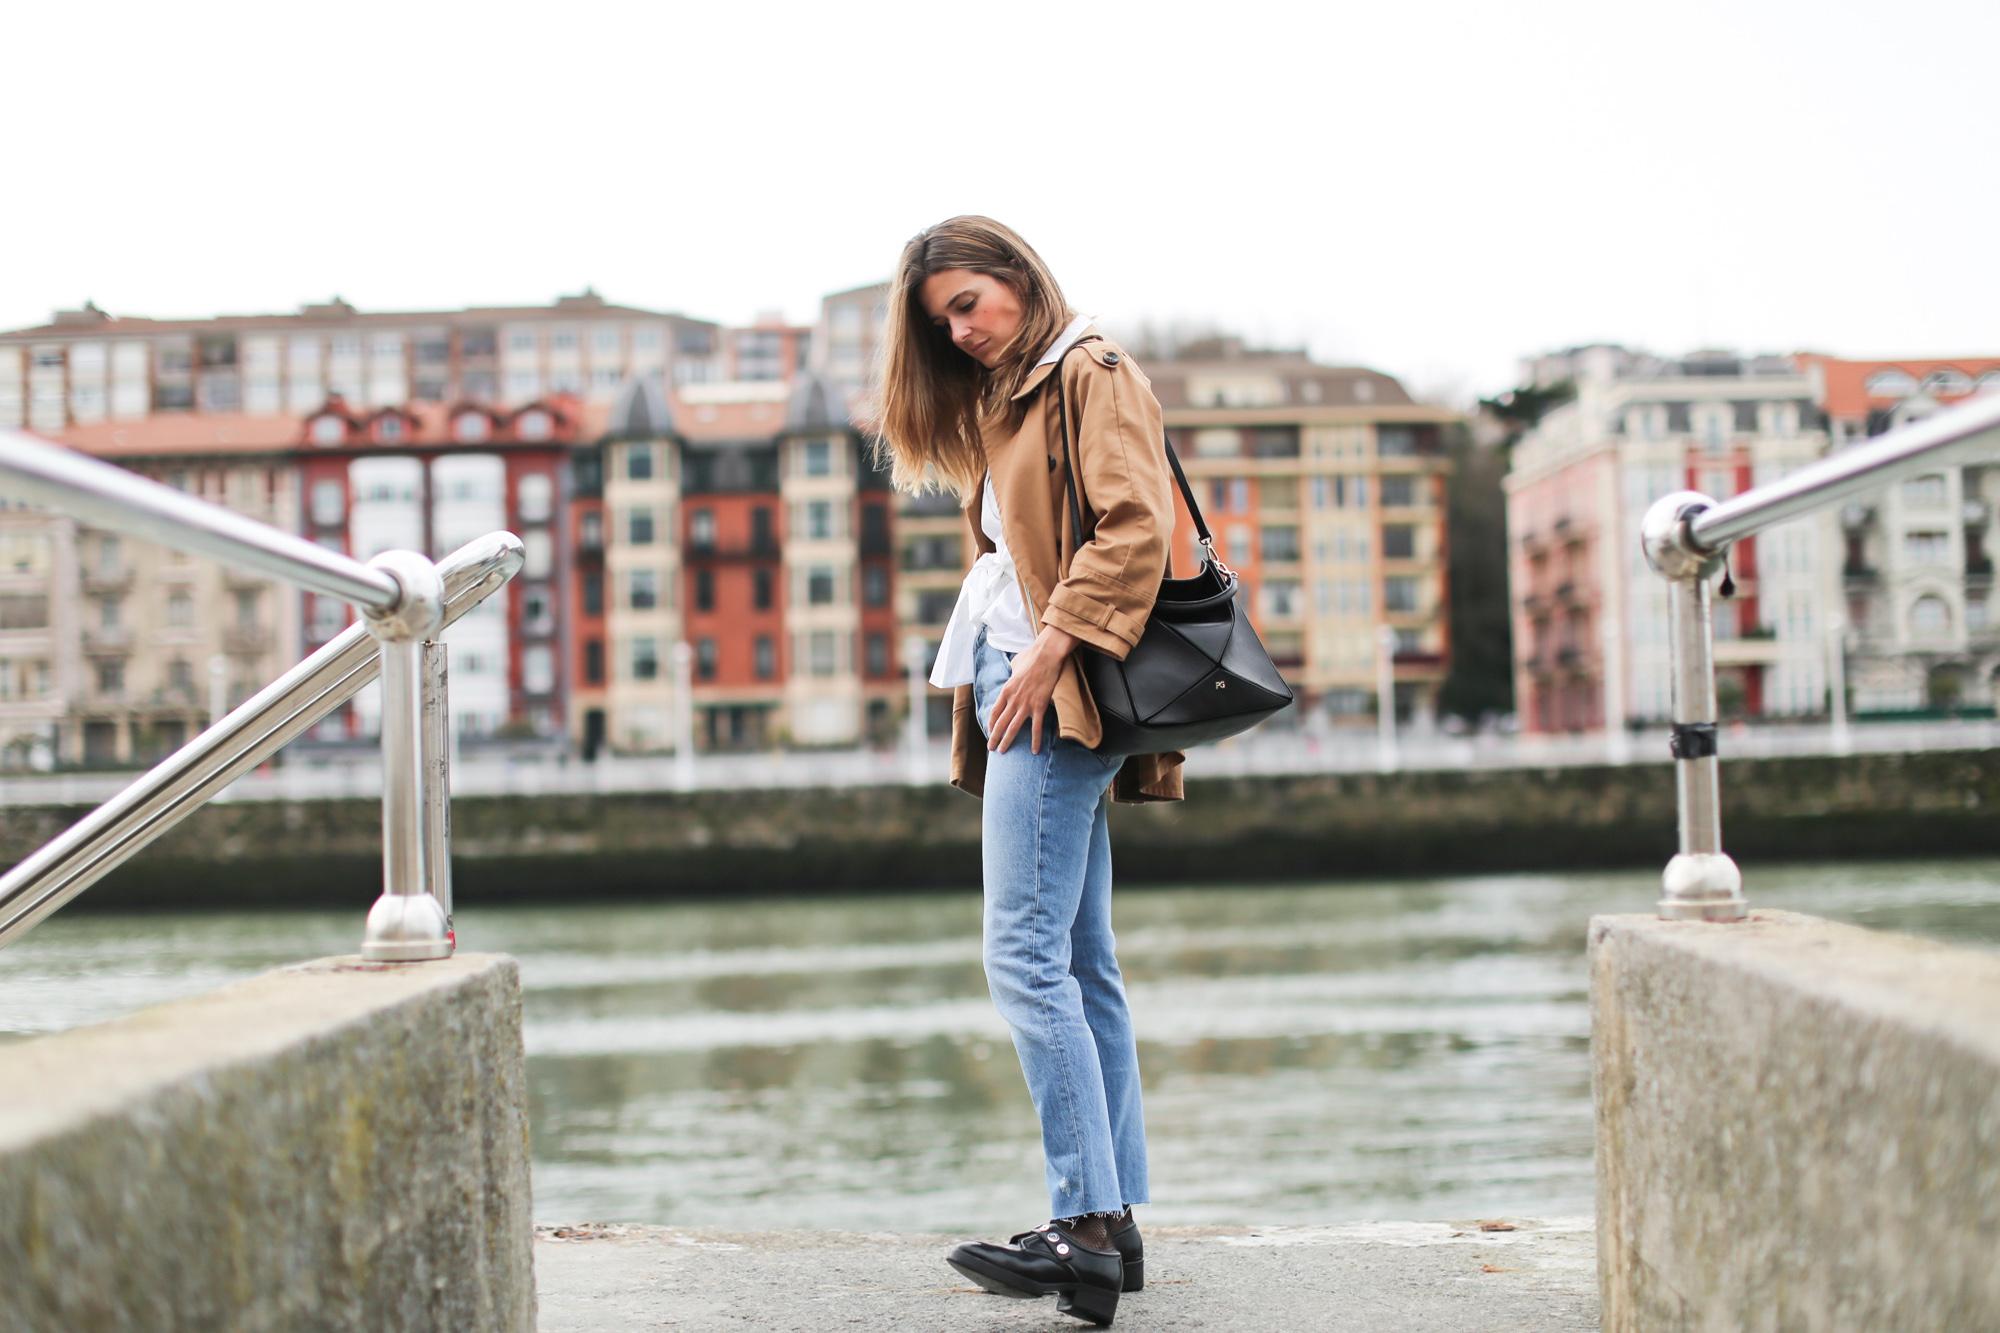 Clochet_streetstyle_fashionblogger_vintagehighwaistedjeans_purificaciongarciatangram_zapatosoxfordSandroParis-3